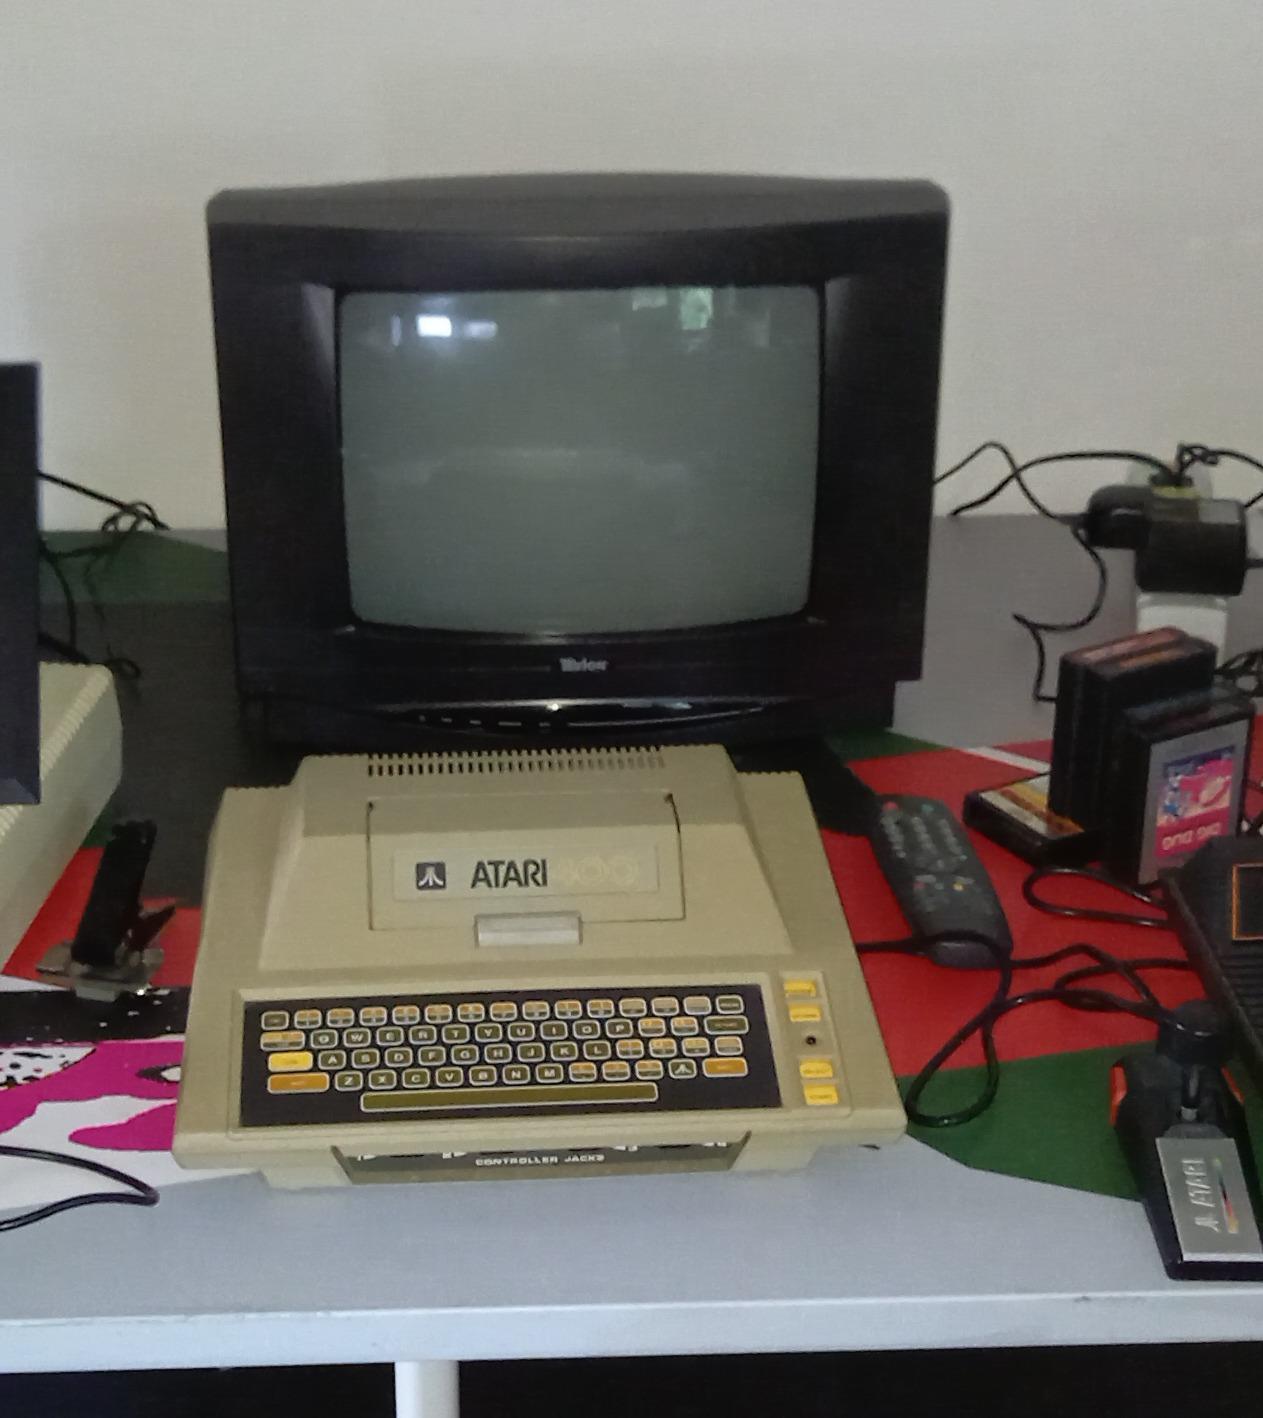 Atari 400 und Hardwarespende - TV